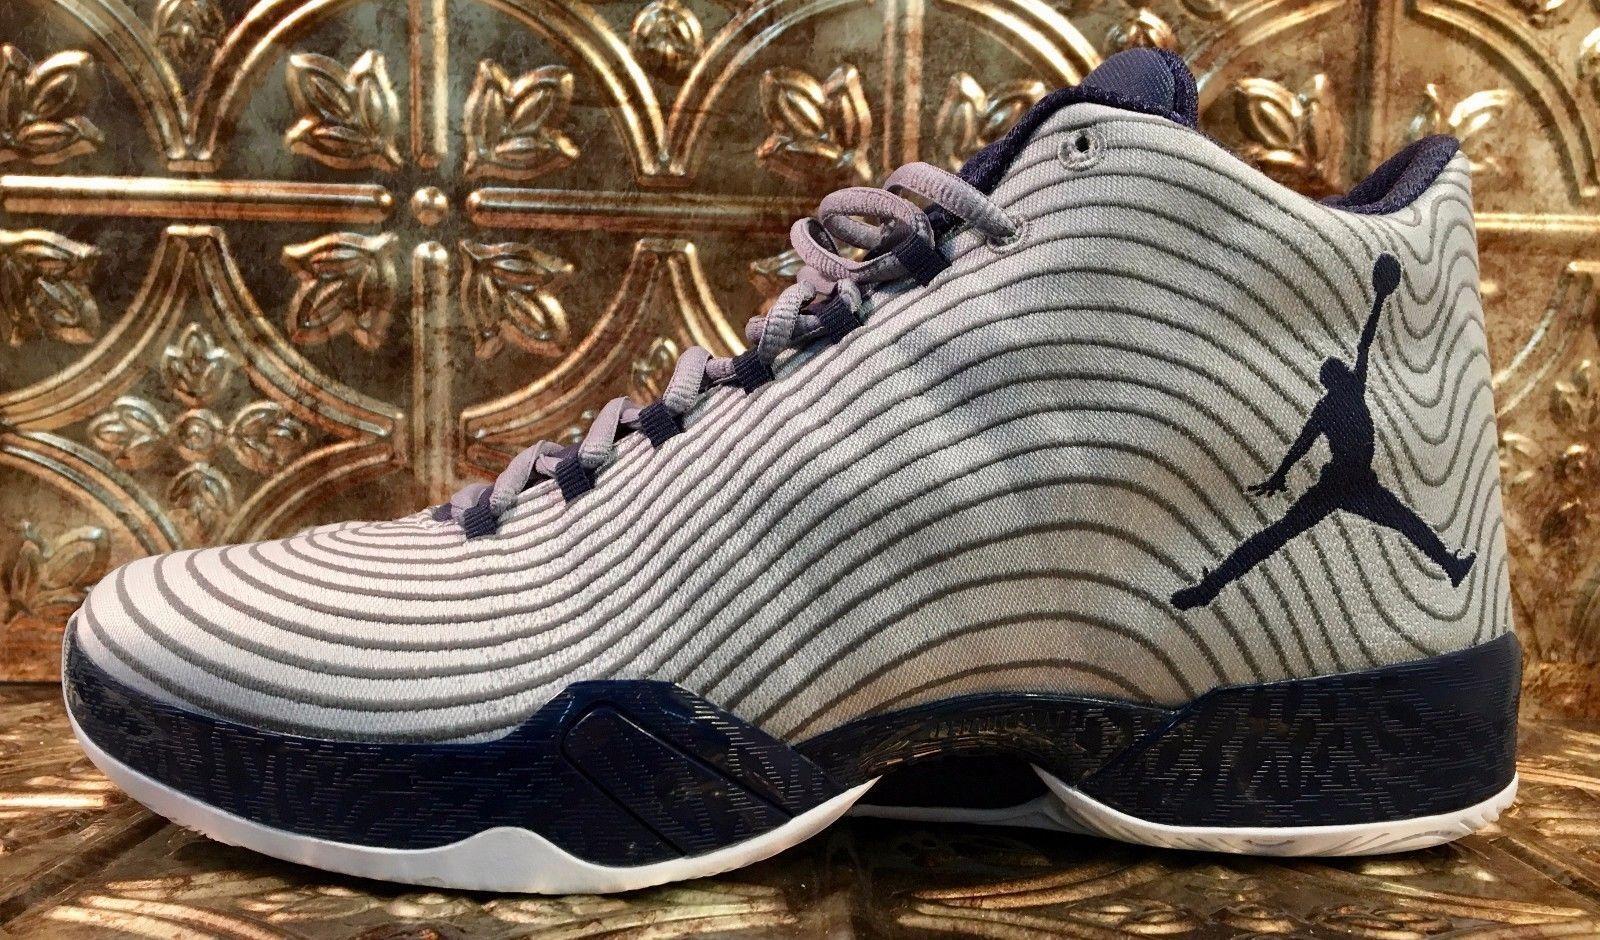 Nike Air Jordan 29 XX9 Georgetown Hoyas PE Size 13. 742965-041 30 31